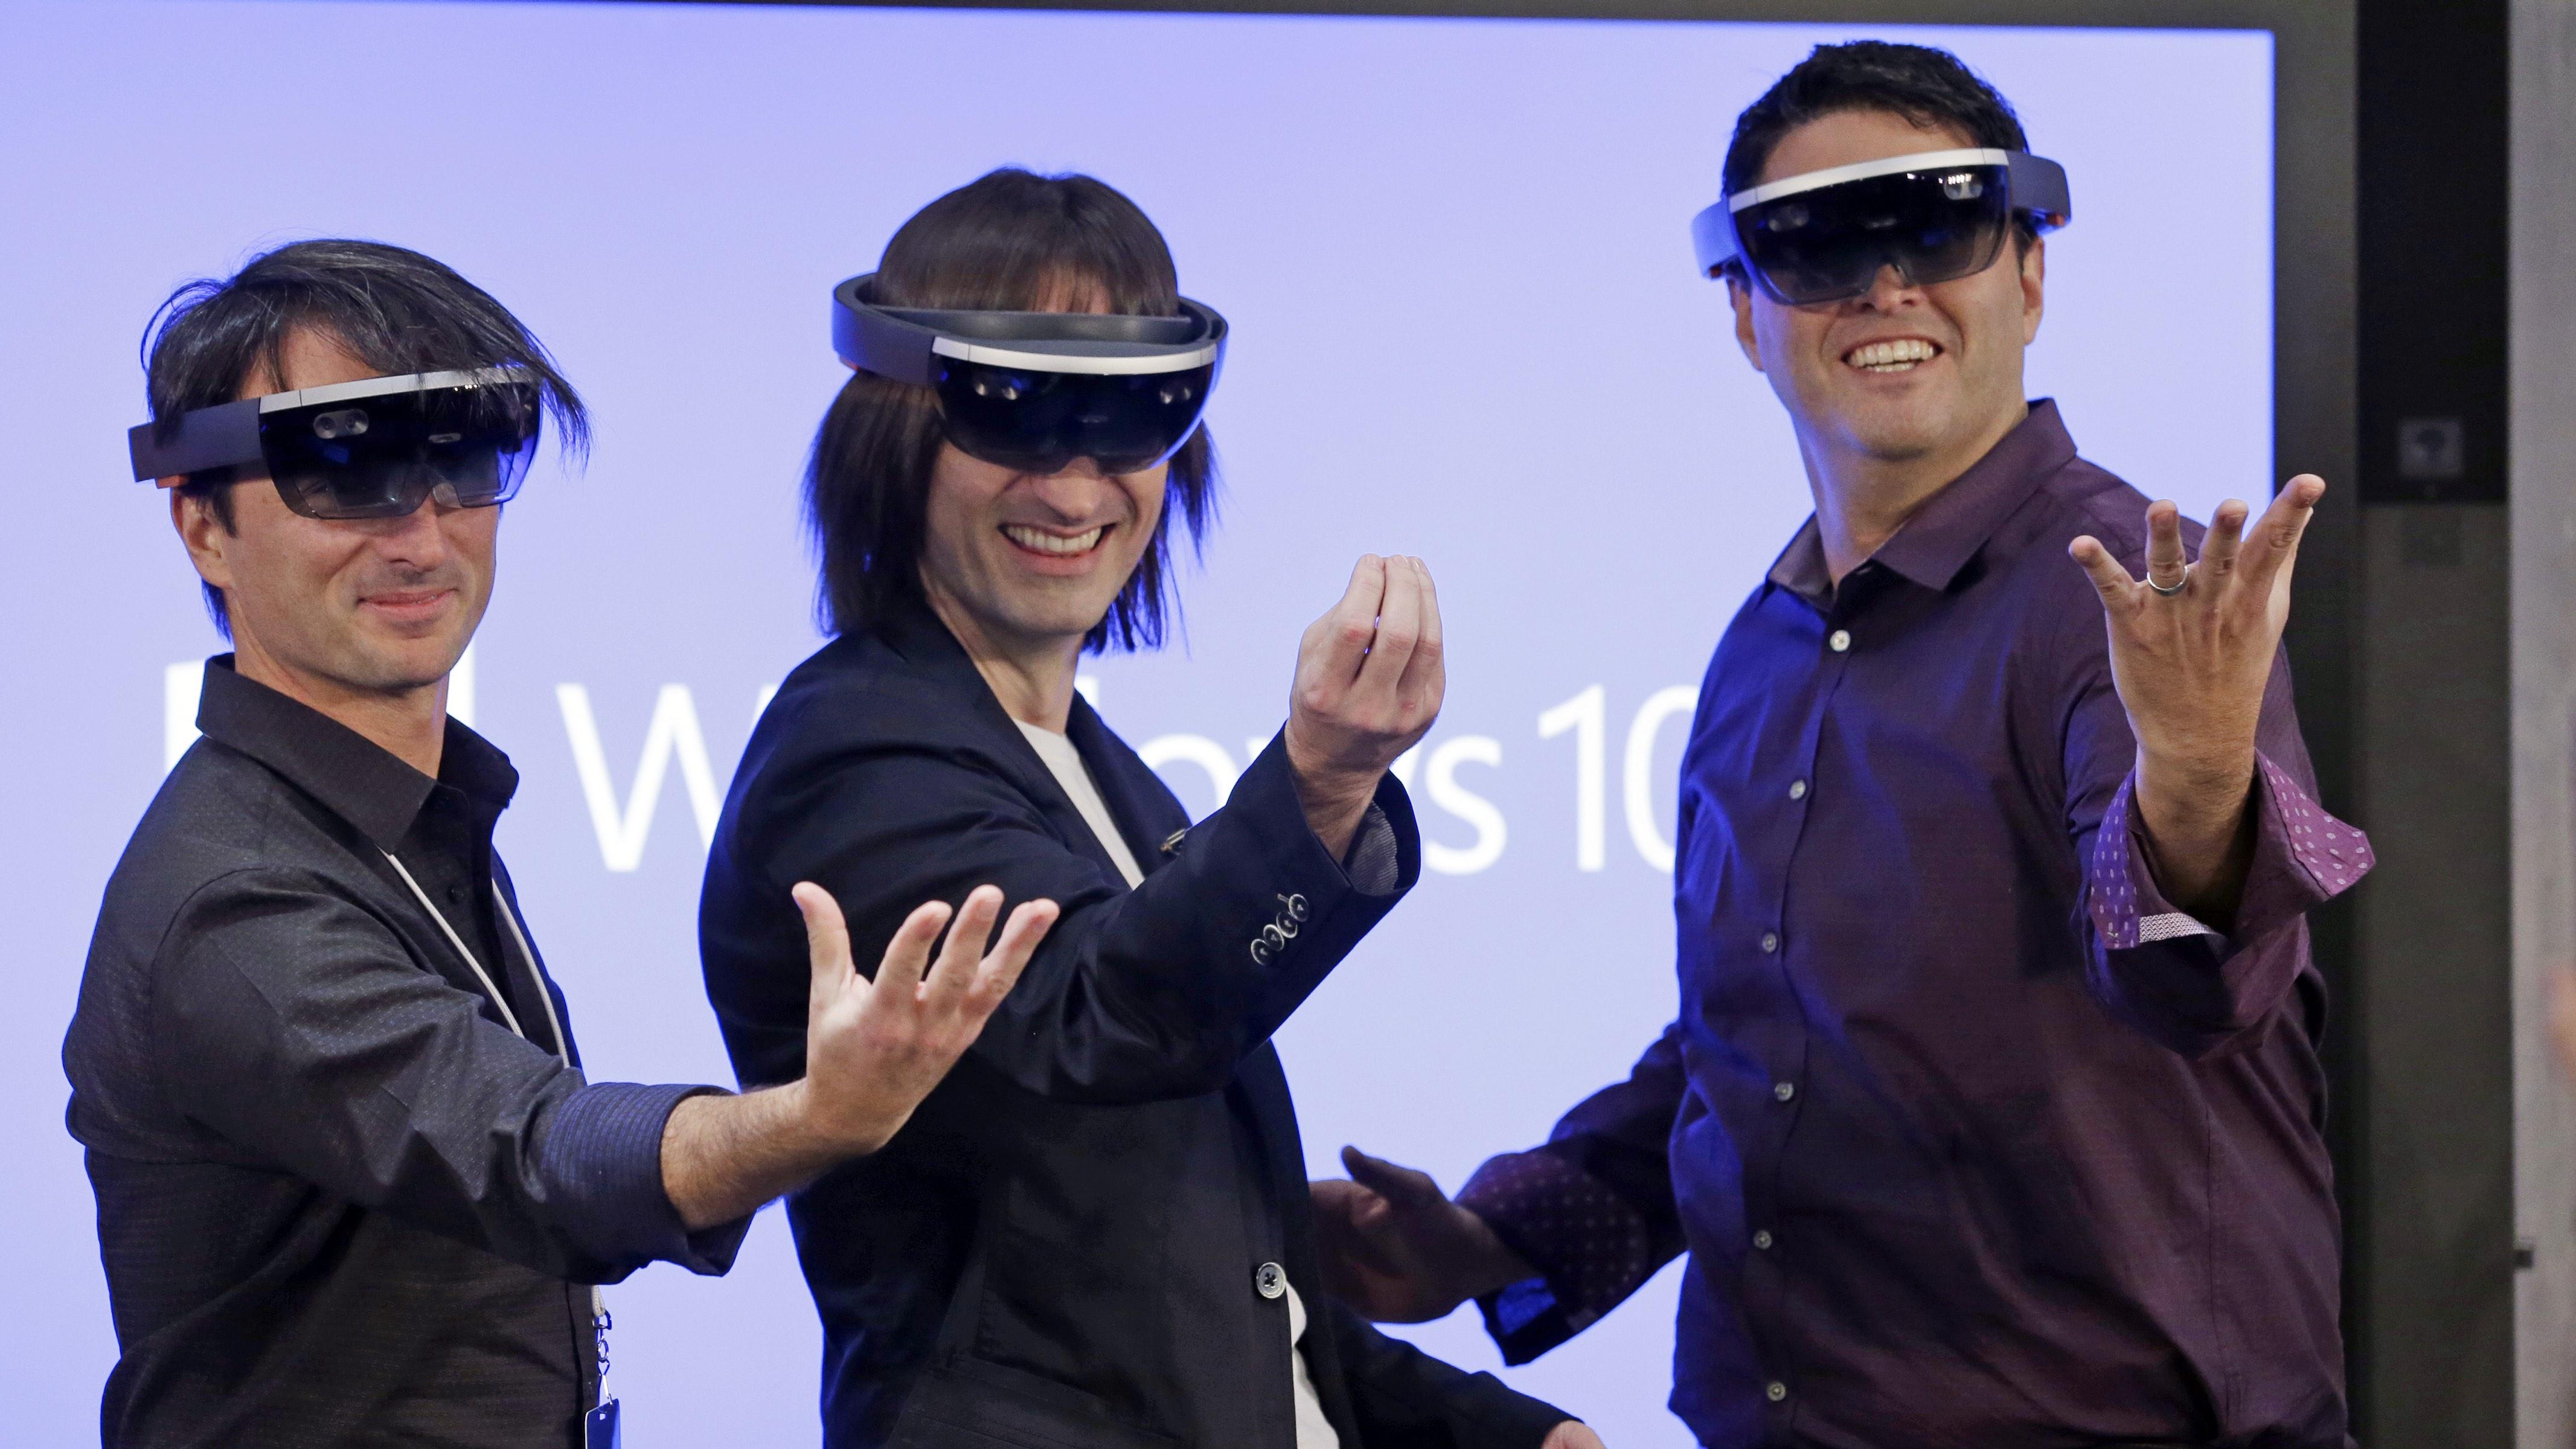 Microsoft executives HoloLens